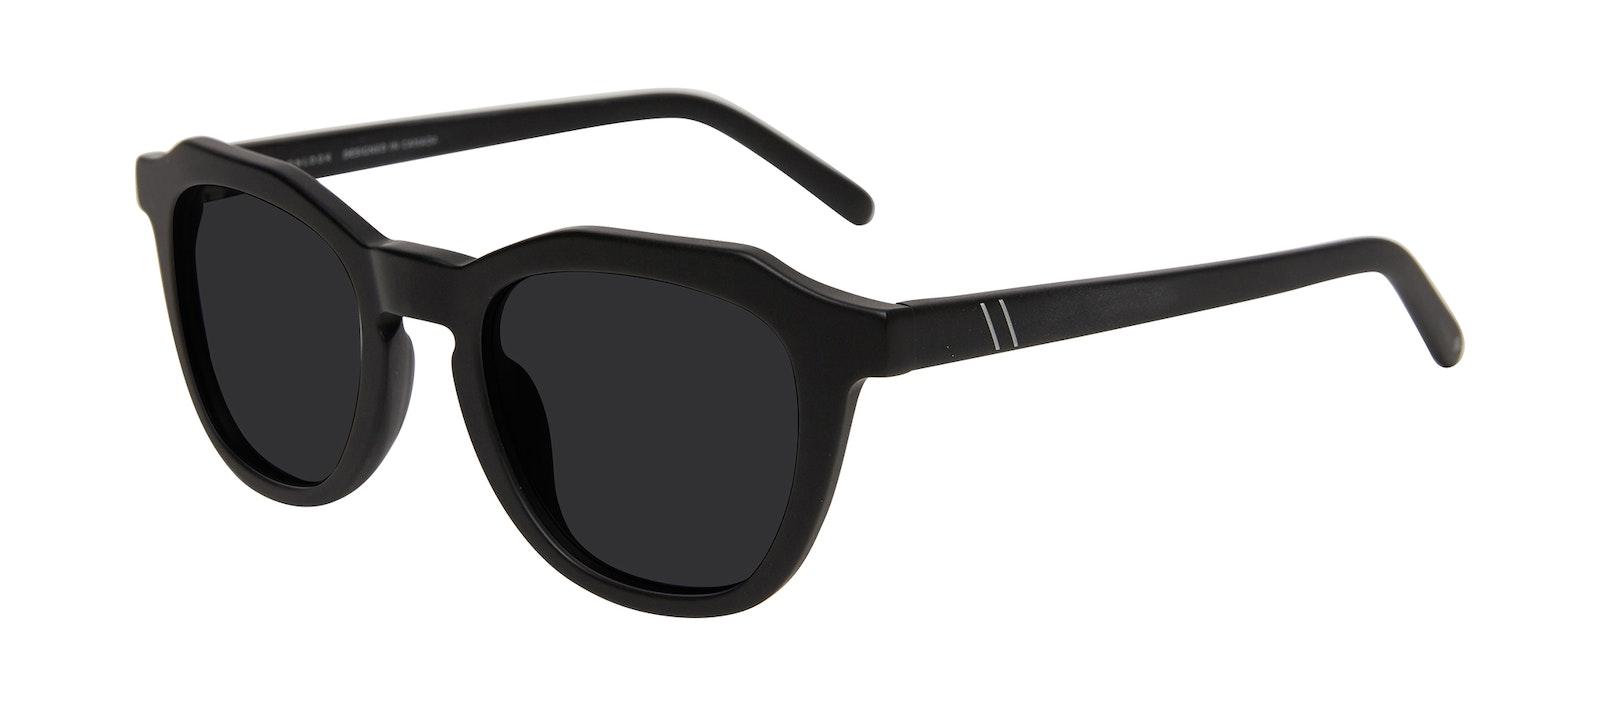 Affordable Fashion Glasses Square Sunglasses Men Action Matte Black Tilt